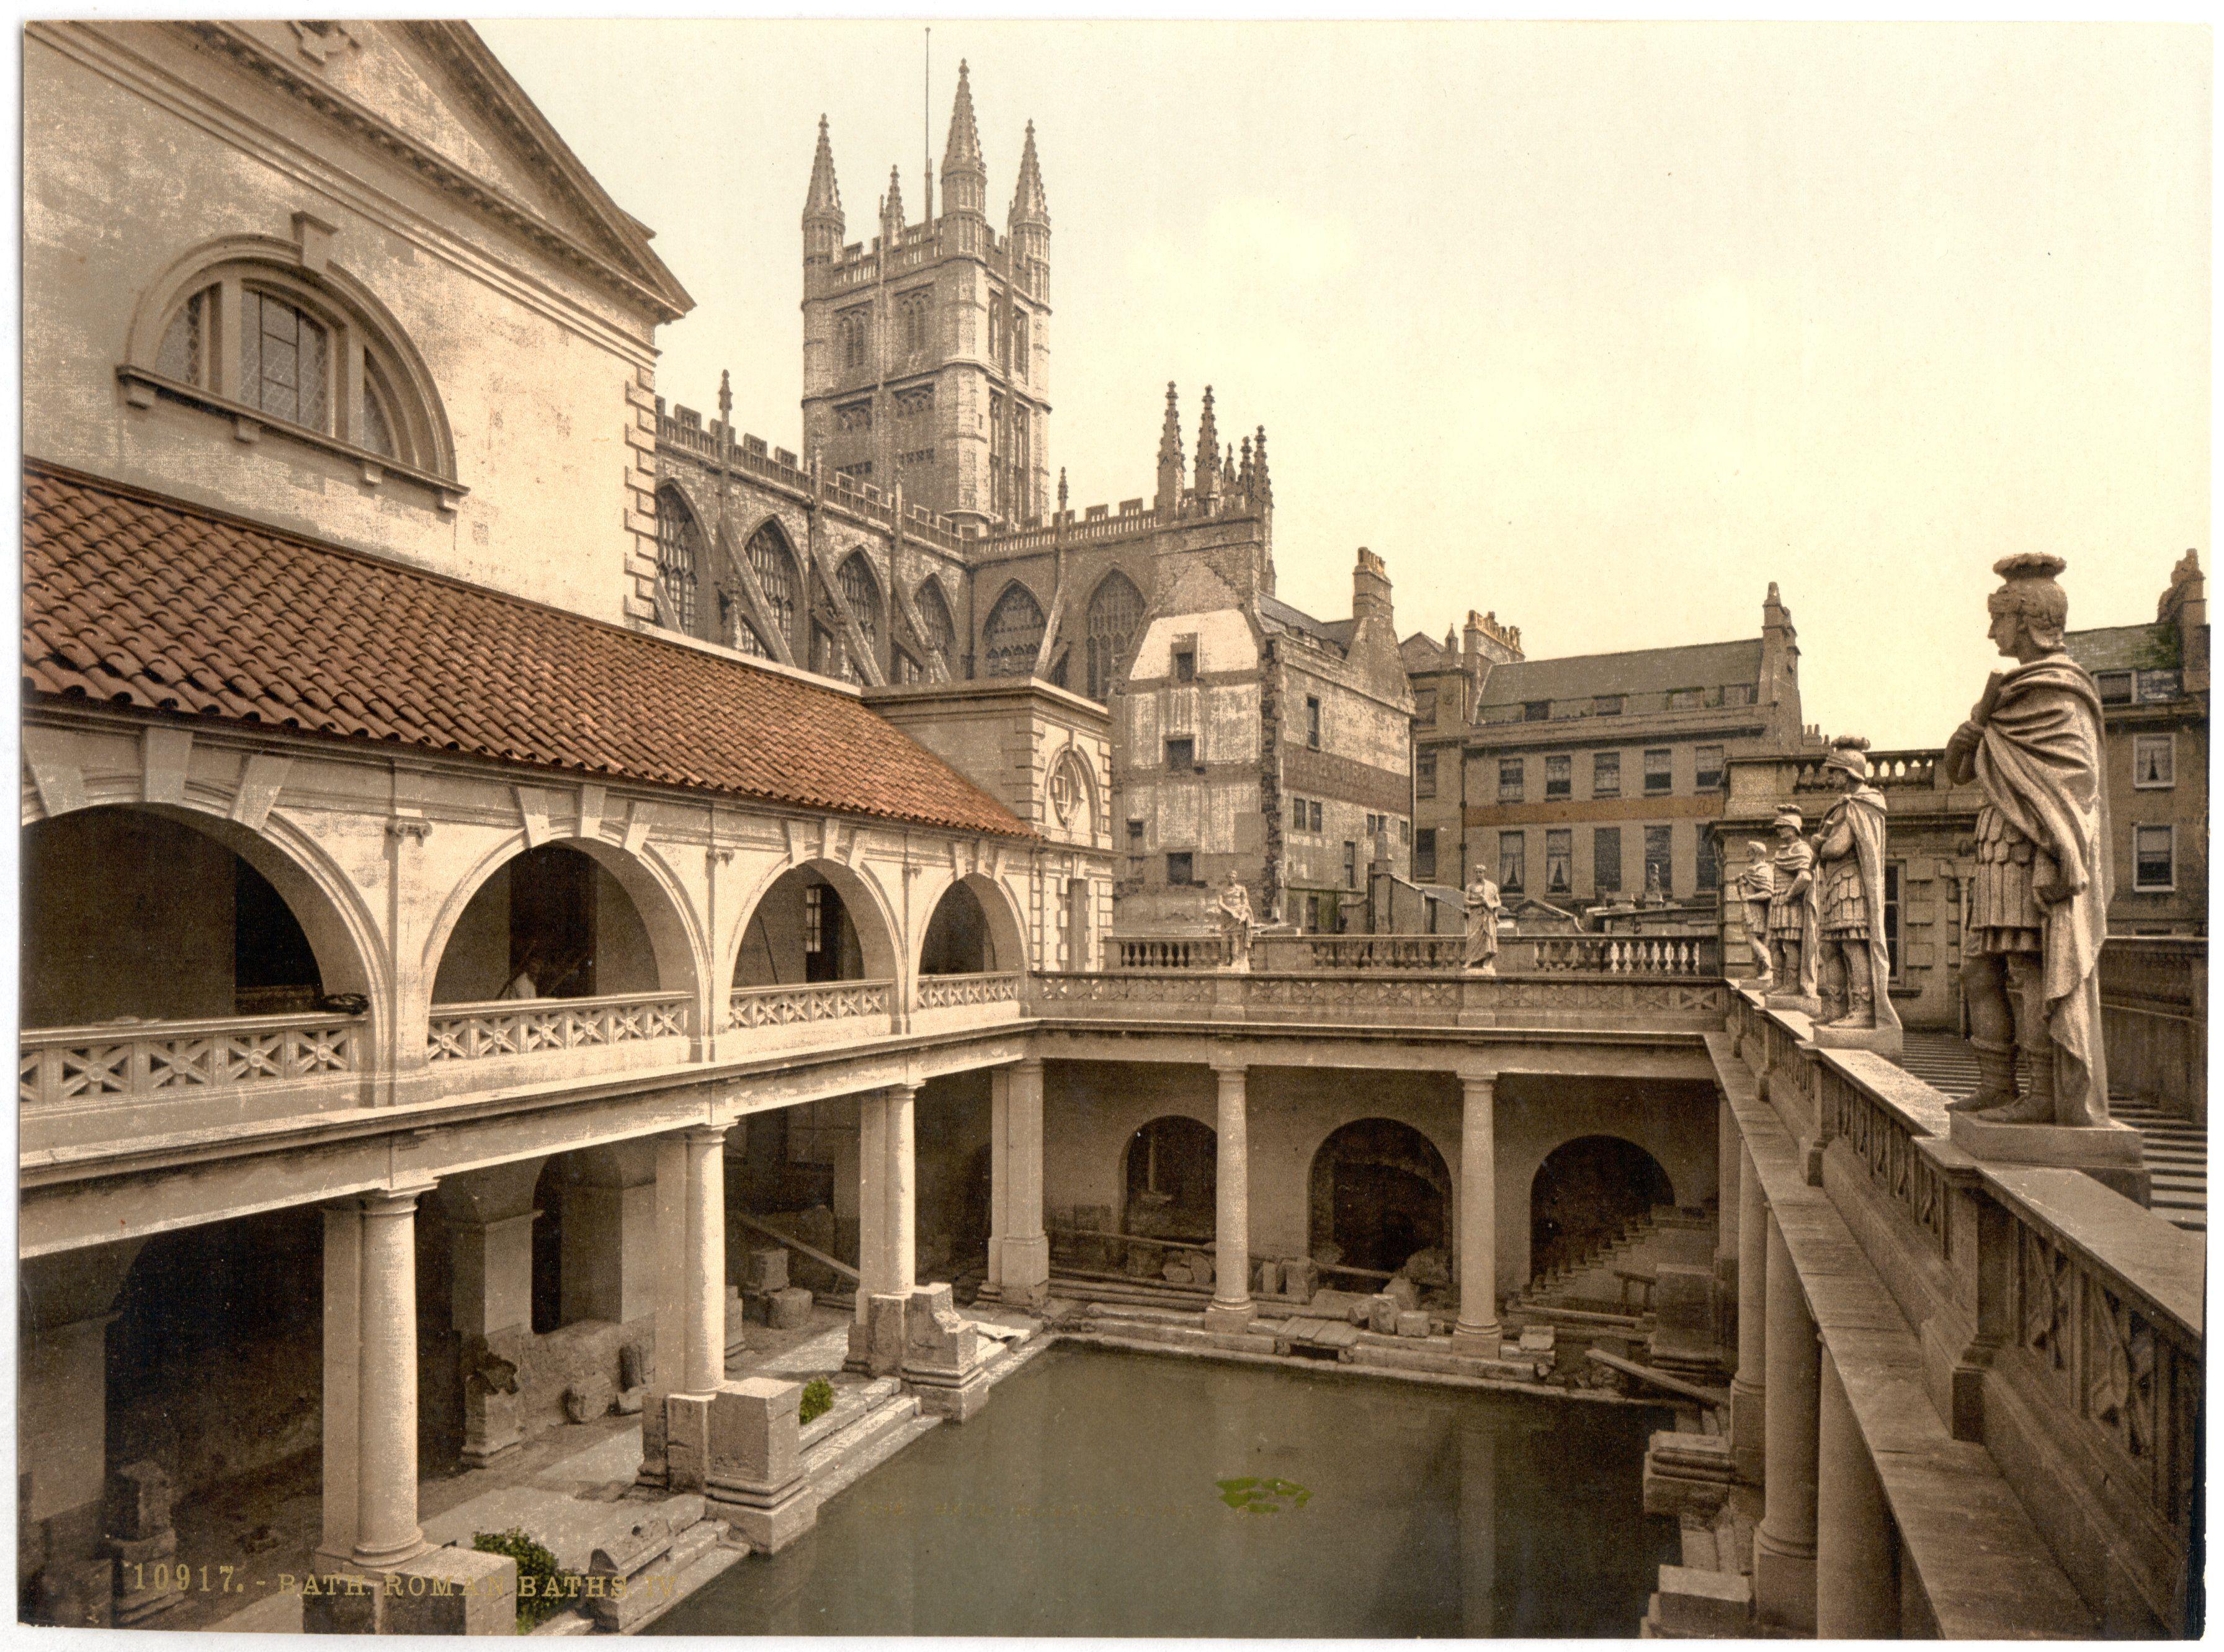 bath- king's and queen's baths | el mundo victoriano | pinterest